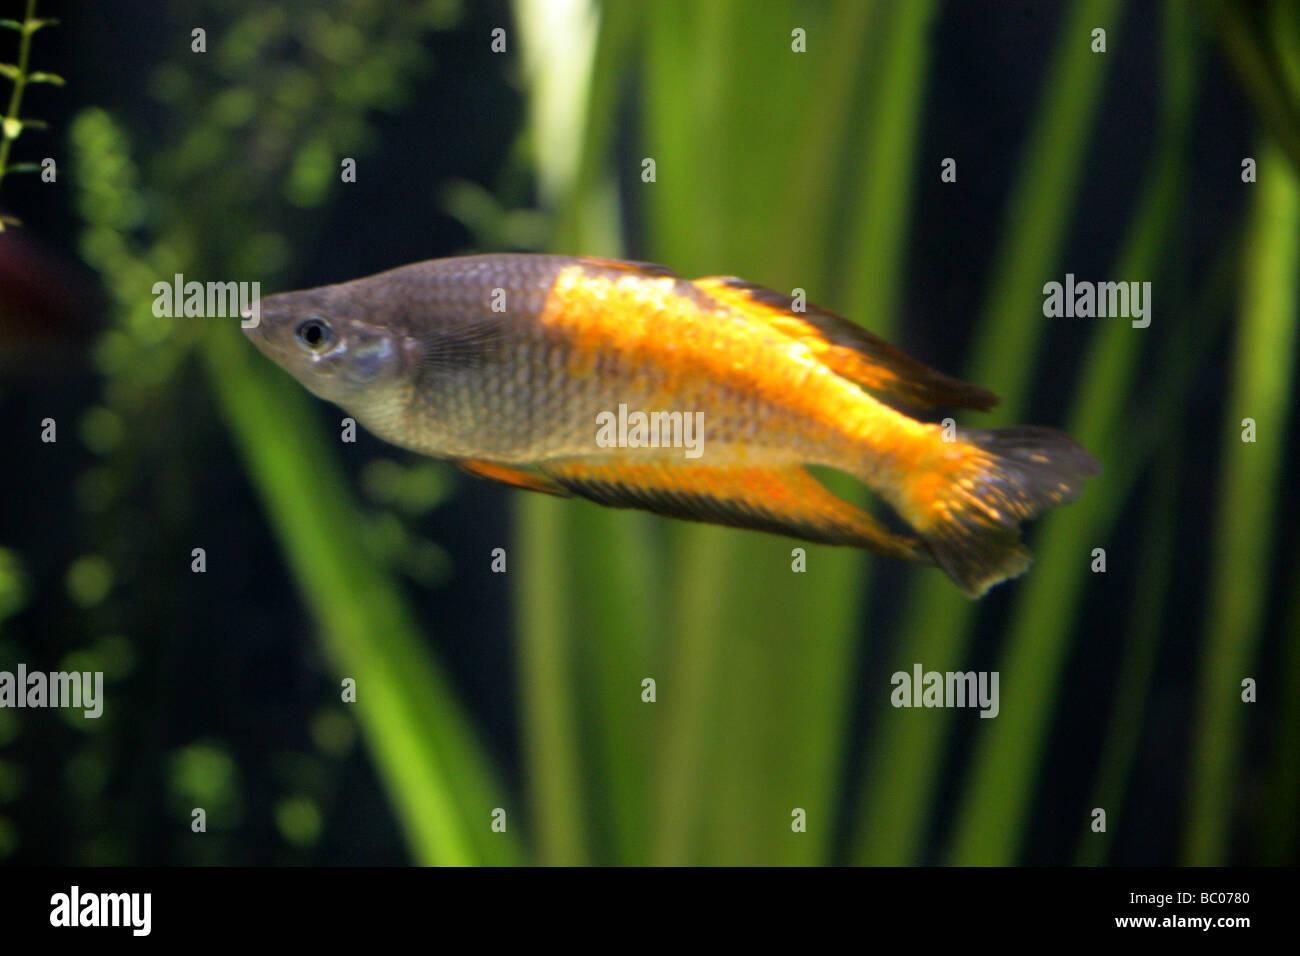 Freshwater aquarium fish boise idaho - Parkinson S Rainbow Fish Melanotaenia Parkinsoni Melanotaeniidae Atheriniformes New Guinea Stock